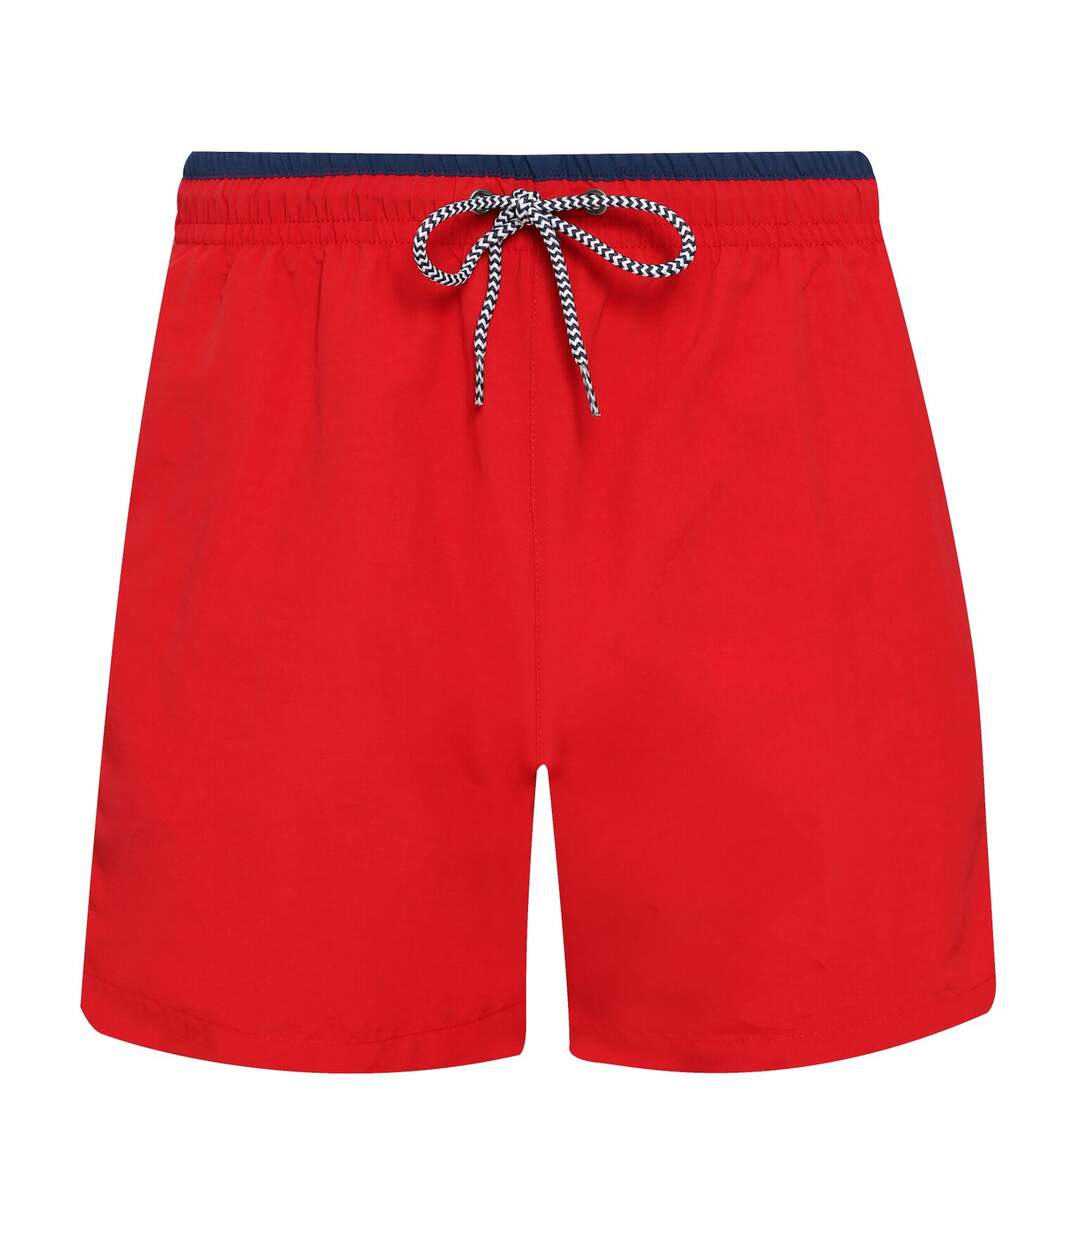 Asquith & Fox Mens Swim Shorts (Navy/Navy) - UTRW6242